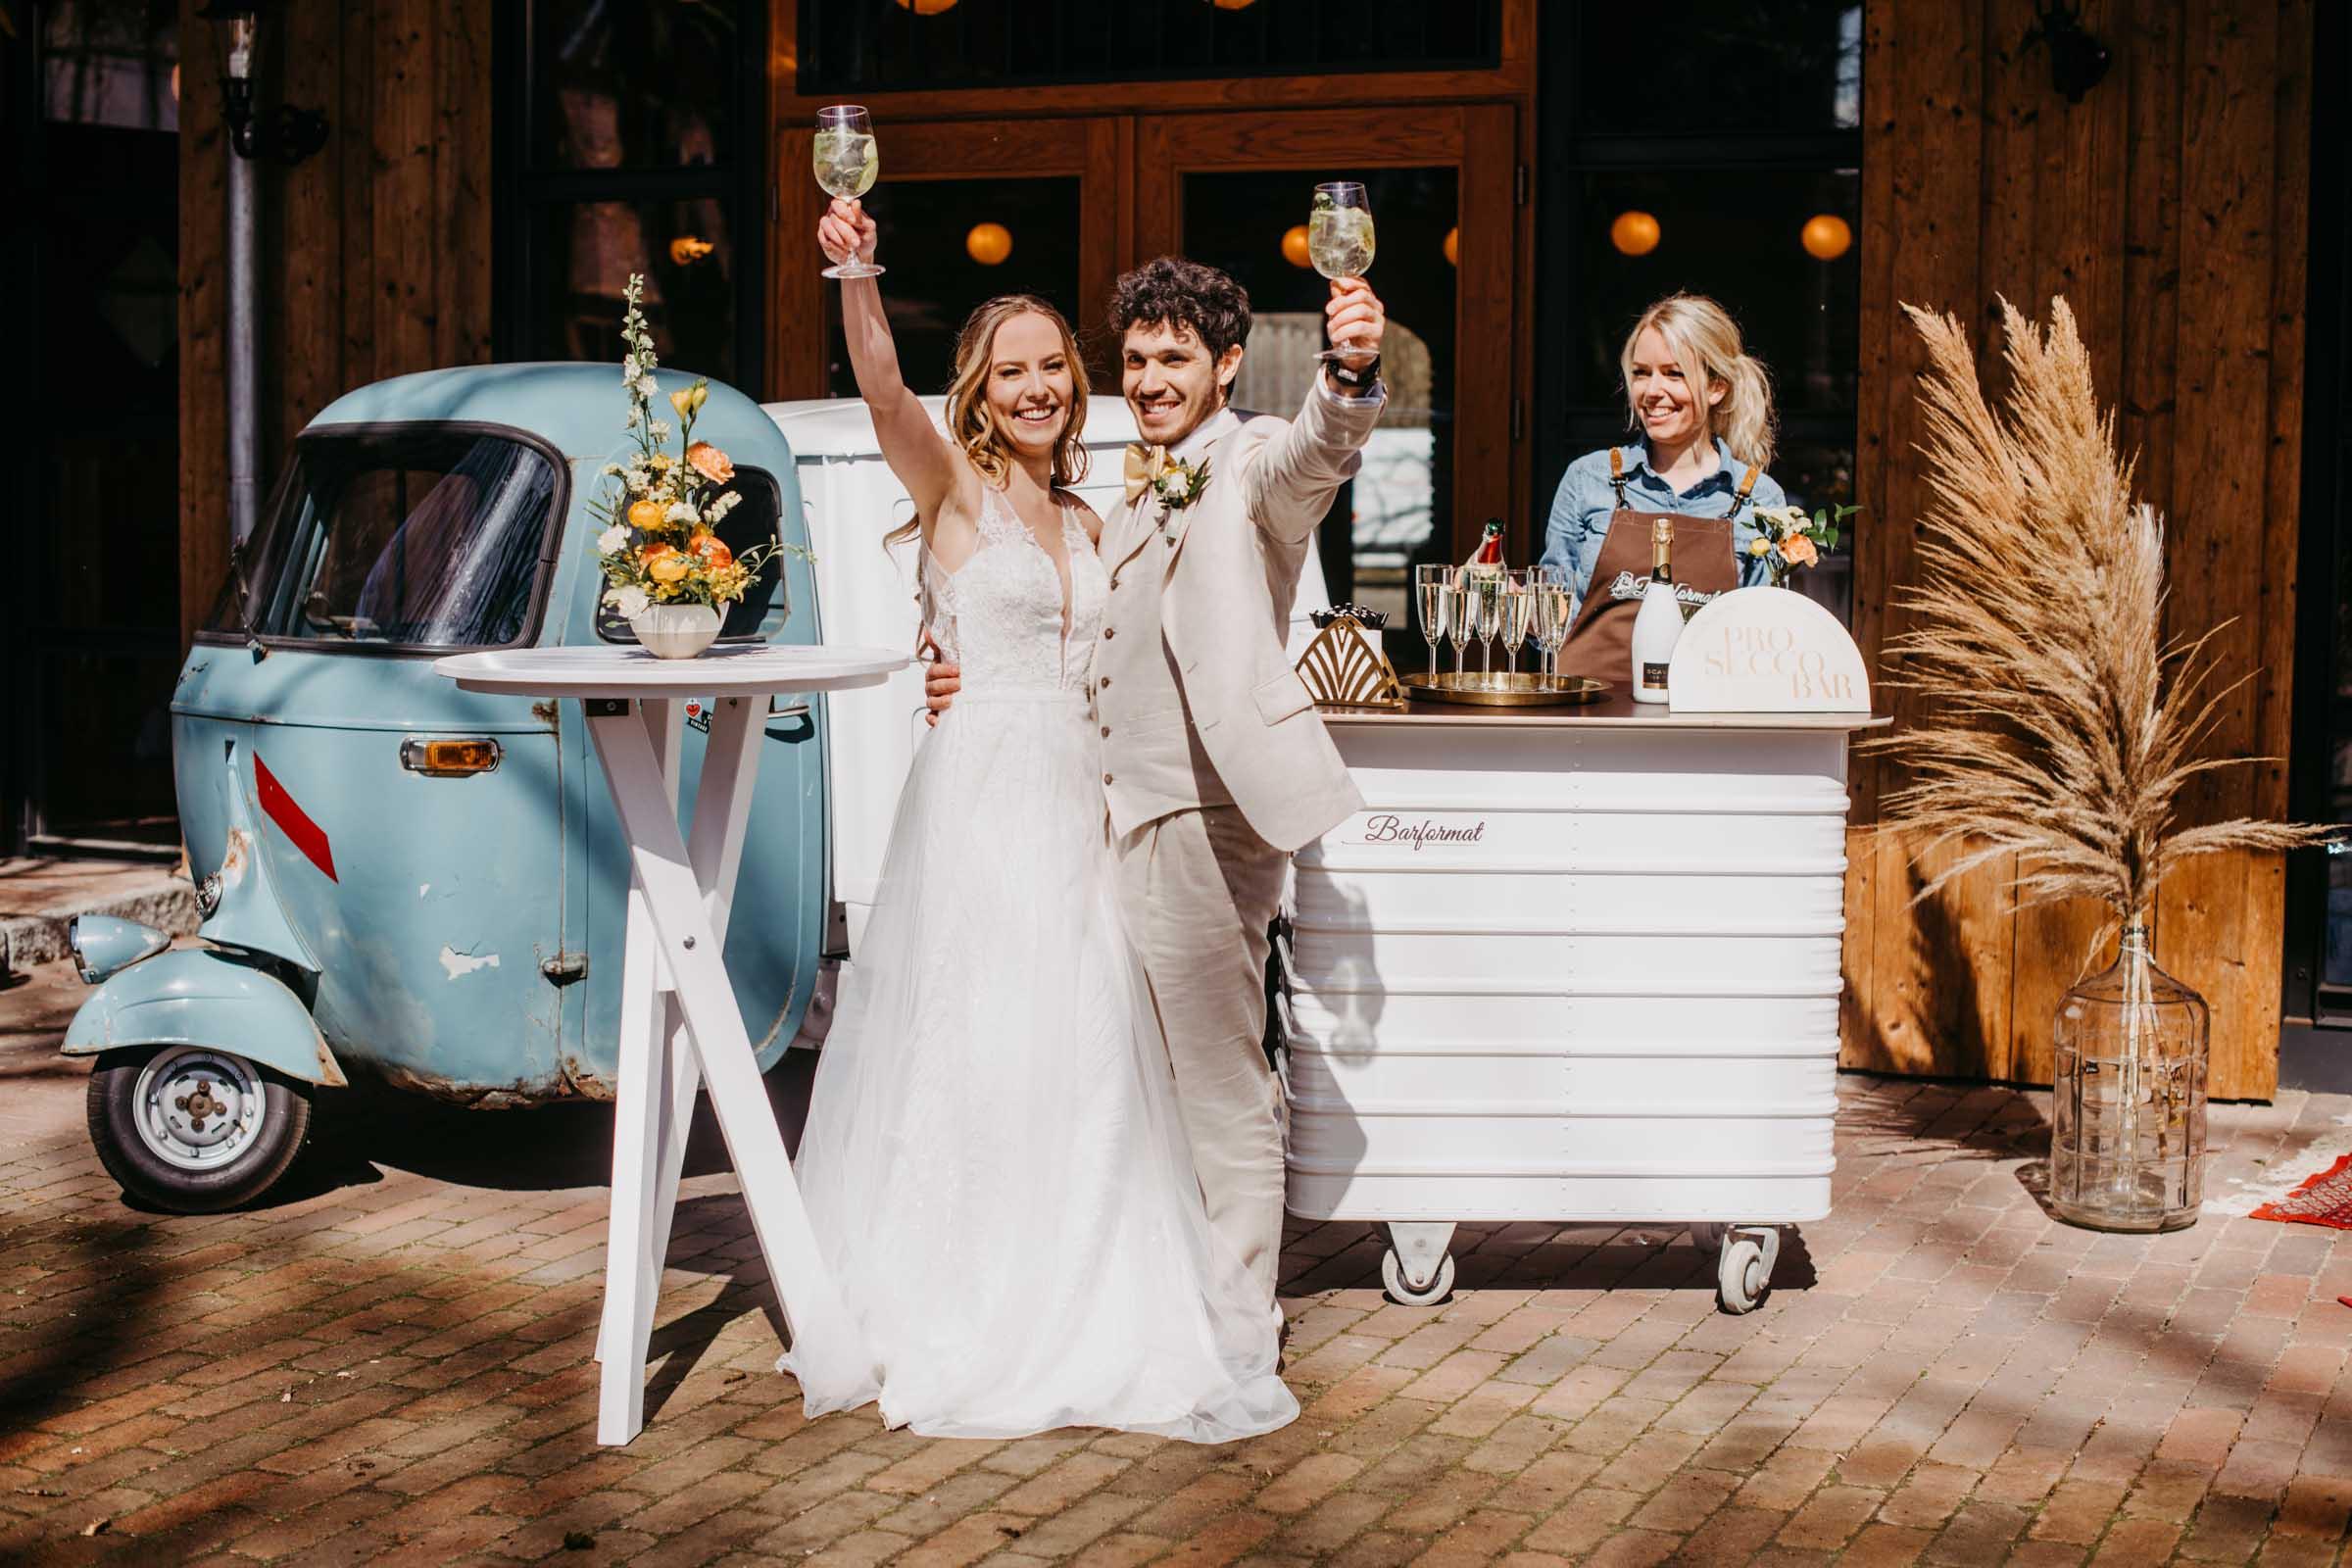 Mobile | Bar | VW | Bulli | Ape | Vespa | Cocktailservice | Cocktail | Bus | Catering | Getränke | Foodtruck | Sektempfang | Standesamt | Hochzeit | Barkeeper | Hochzeit | Event | Buchen | Mieten | Barformat